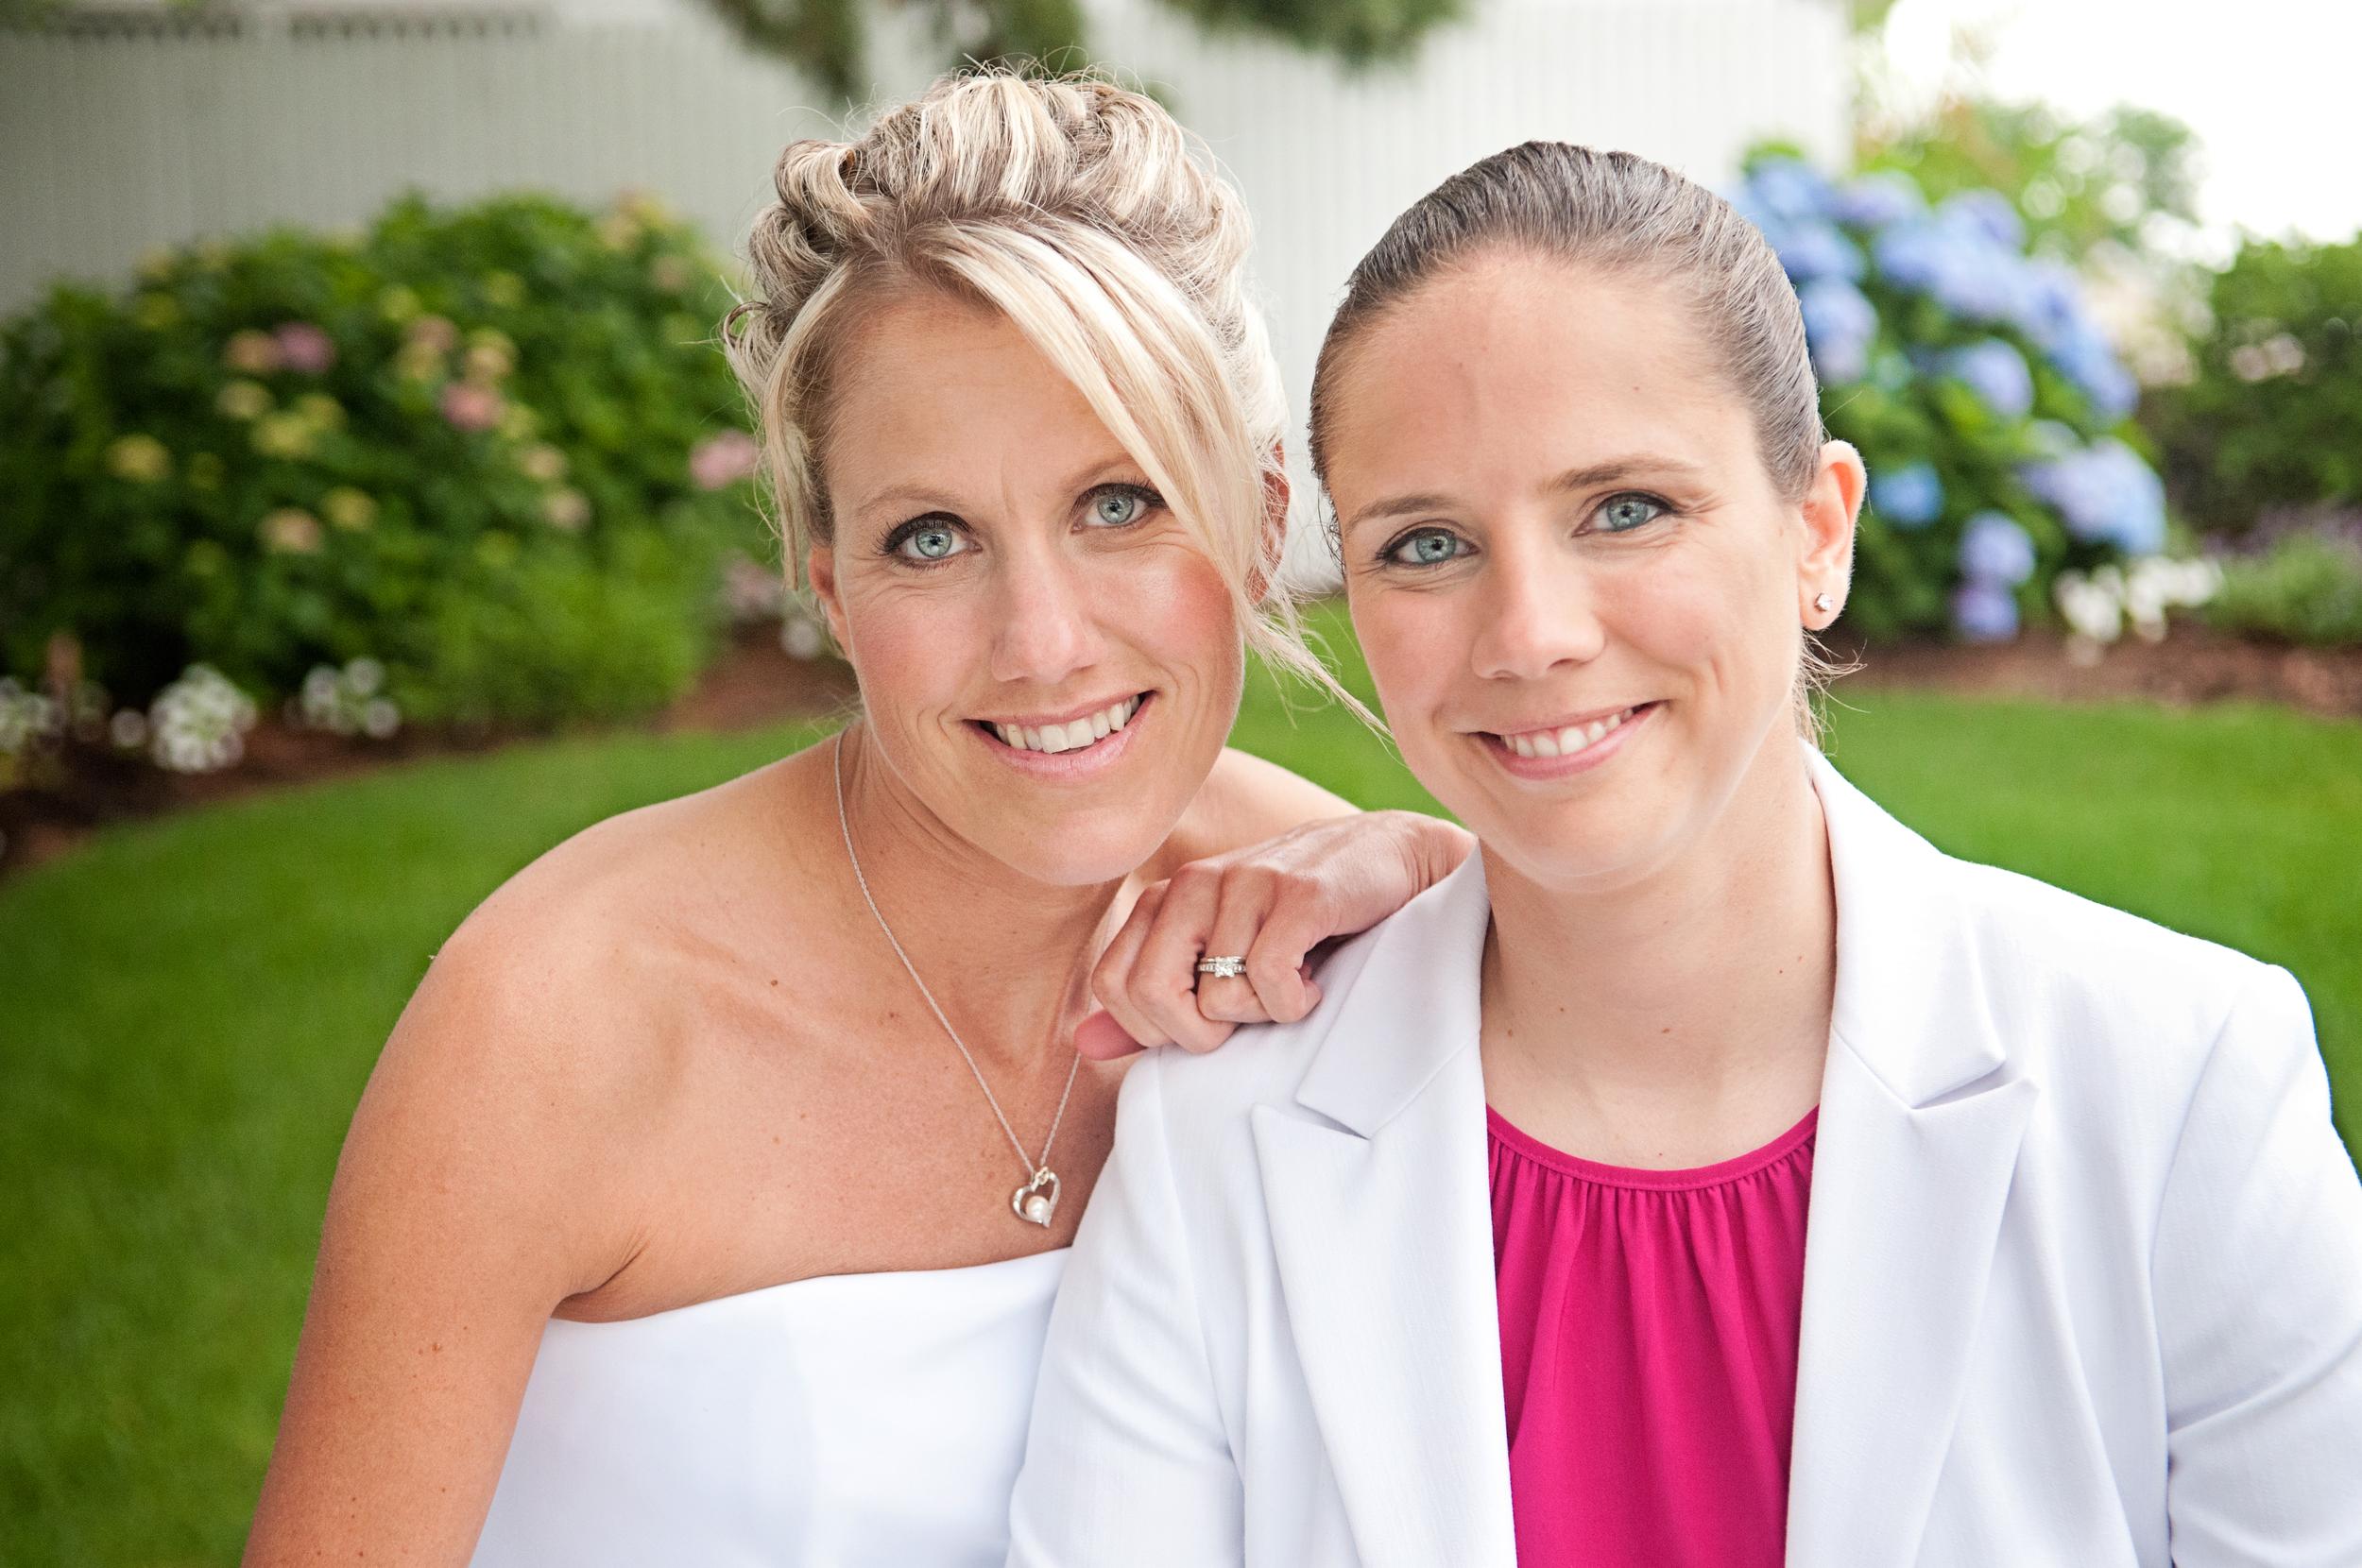 Angela_Chicoski_CT_wedding_photographer_045.jpg